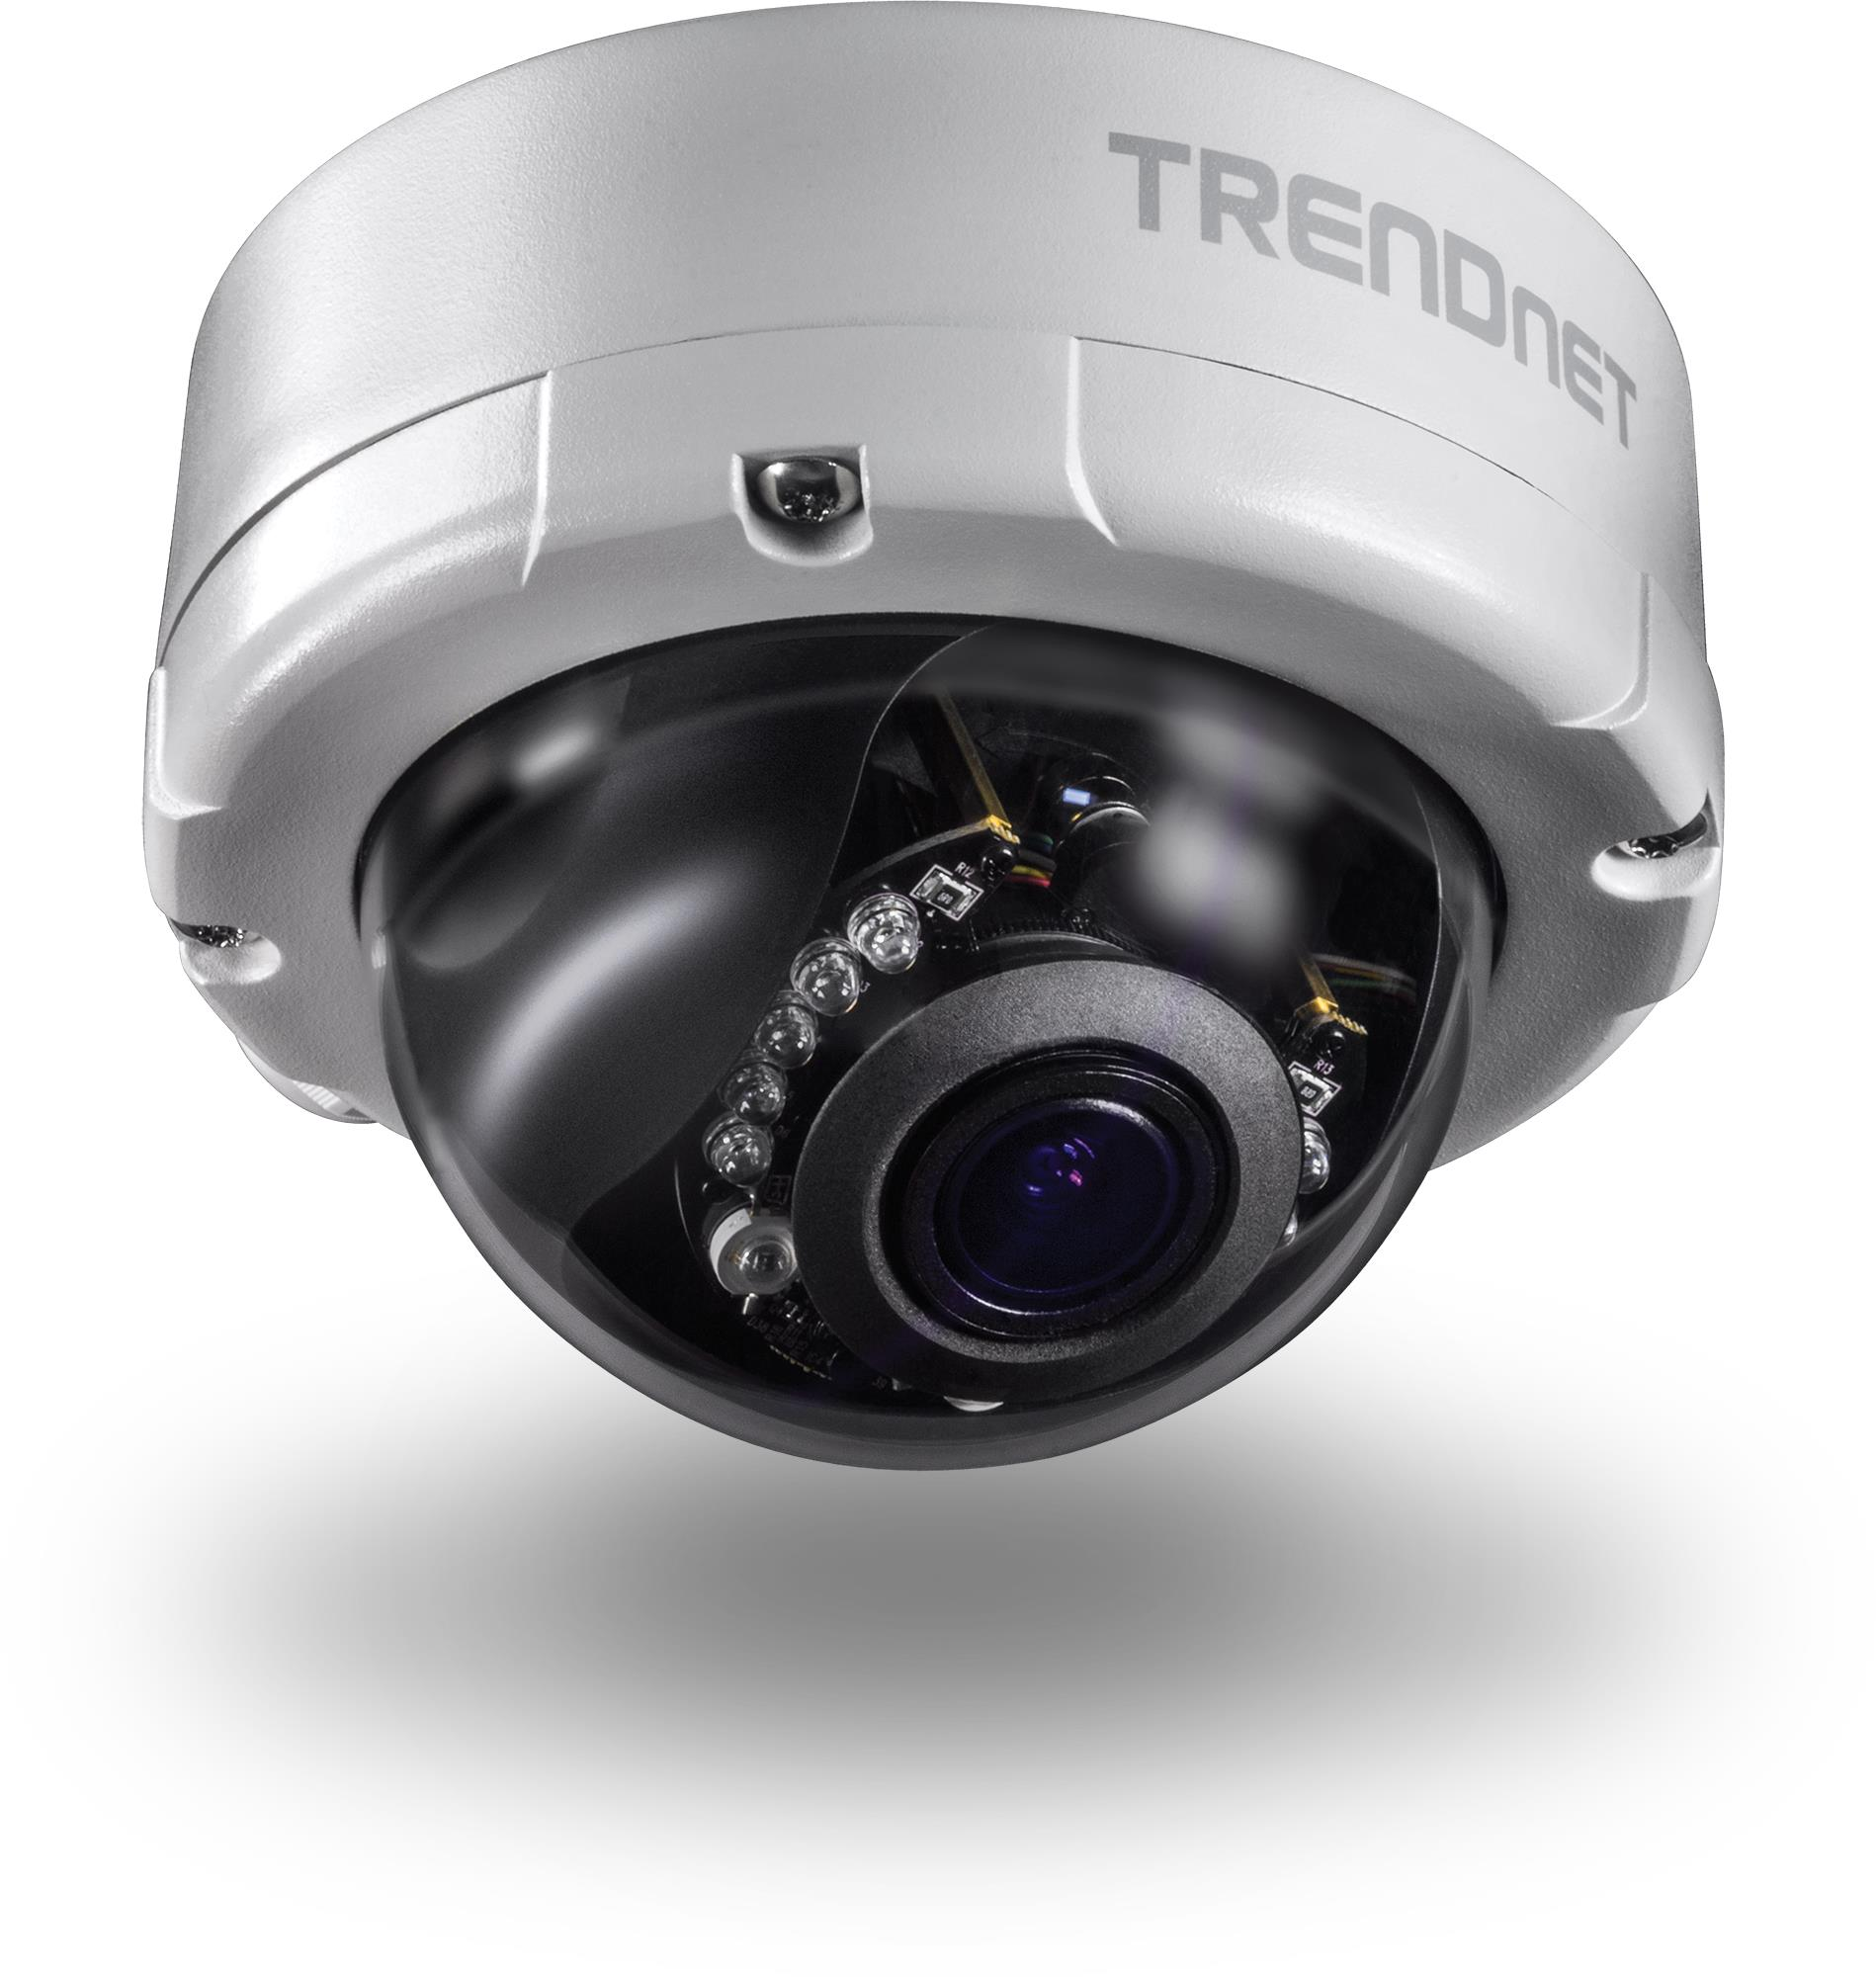 TRENDnet TV-IP345PI (4MP) Network Camera Dome Vari-Focal PoE Day/Night Indoor/Outdoor Silver (V1.0R)